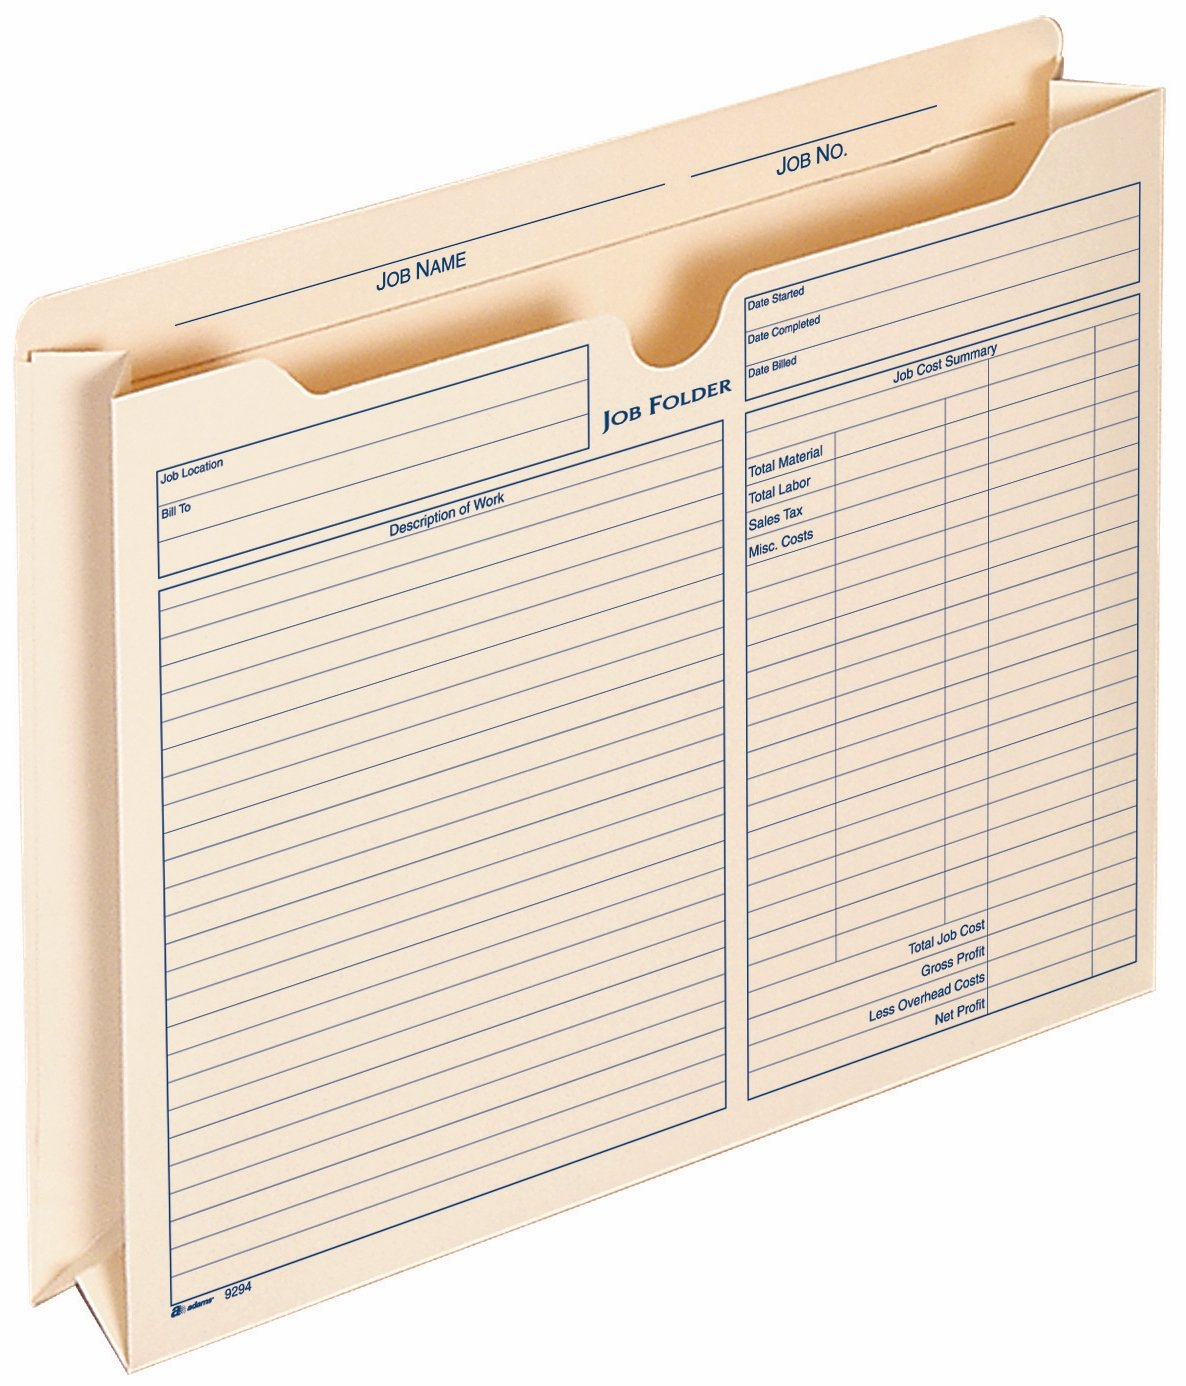 Adams 2 Inch Expanding Job Folder, , 9.5 x 11.75 Inches, Manila, 15 per Pack (9294E)